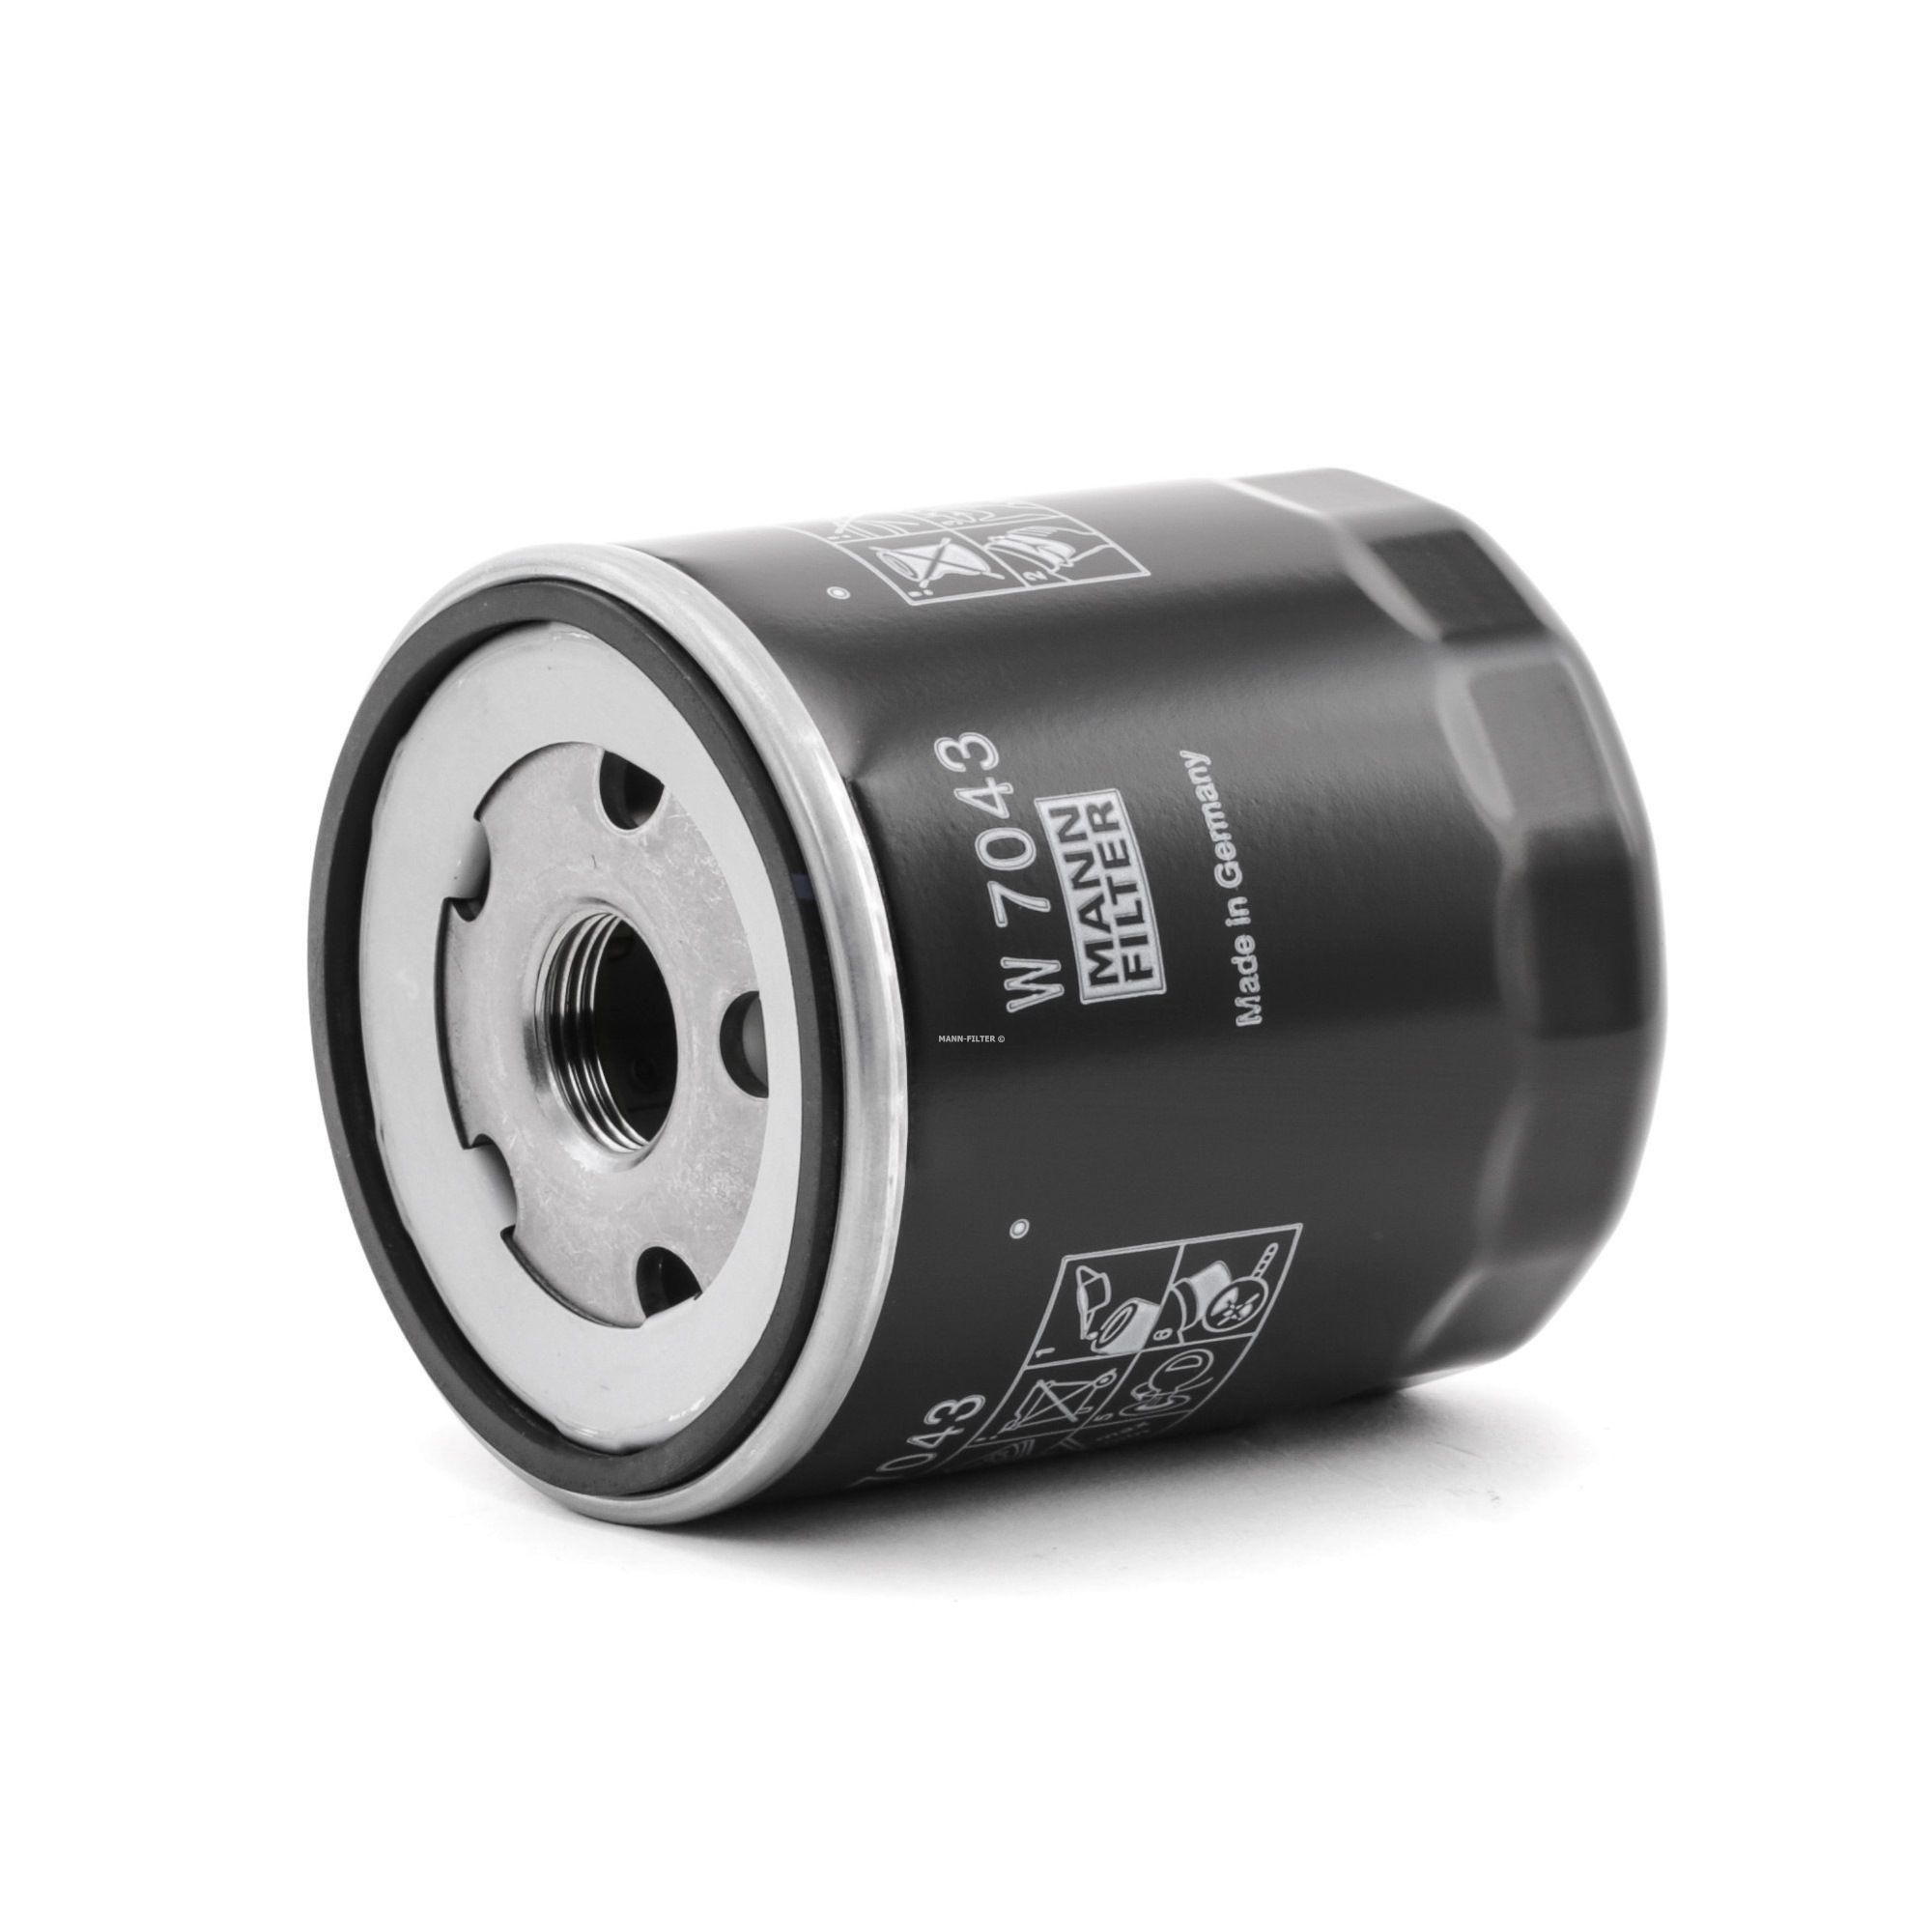 MANN-FILTER: Original Ölfilter W 7043 (Innendurchmesser 2: 62mm, Innendurchmesser 2: 62mm, Ø: 76mm, Außendurchmesser 2: 72mm, Höhe: 91mm)